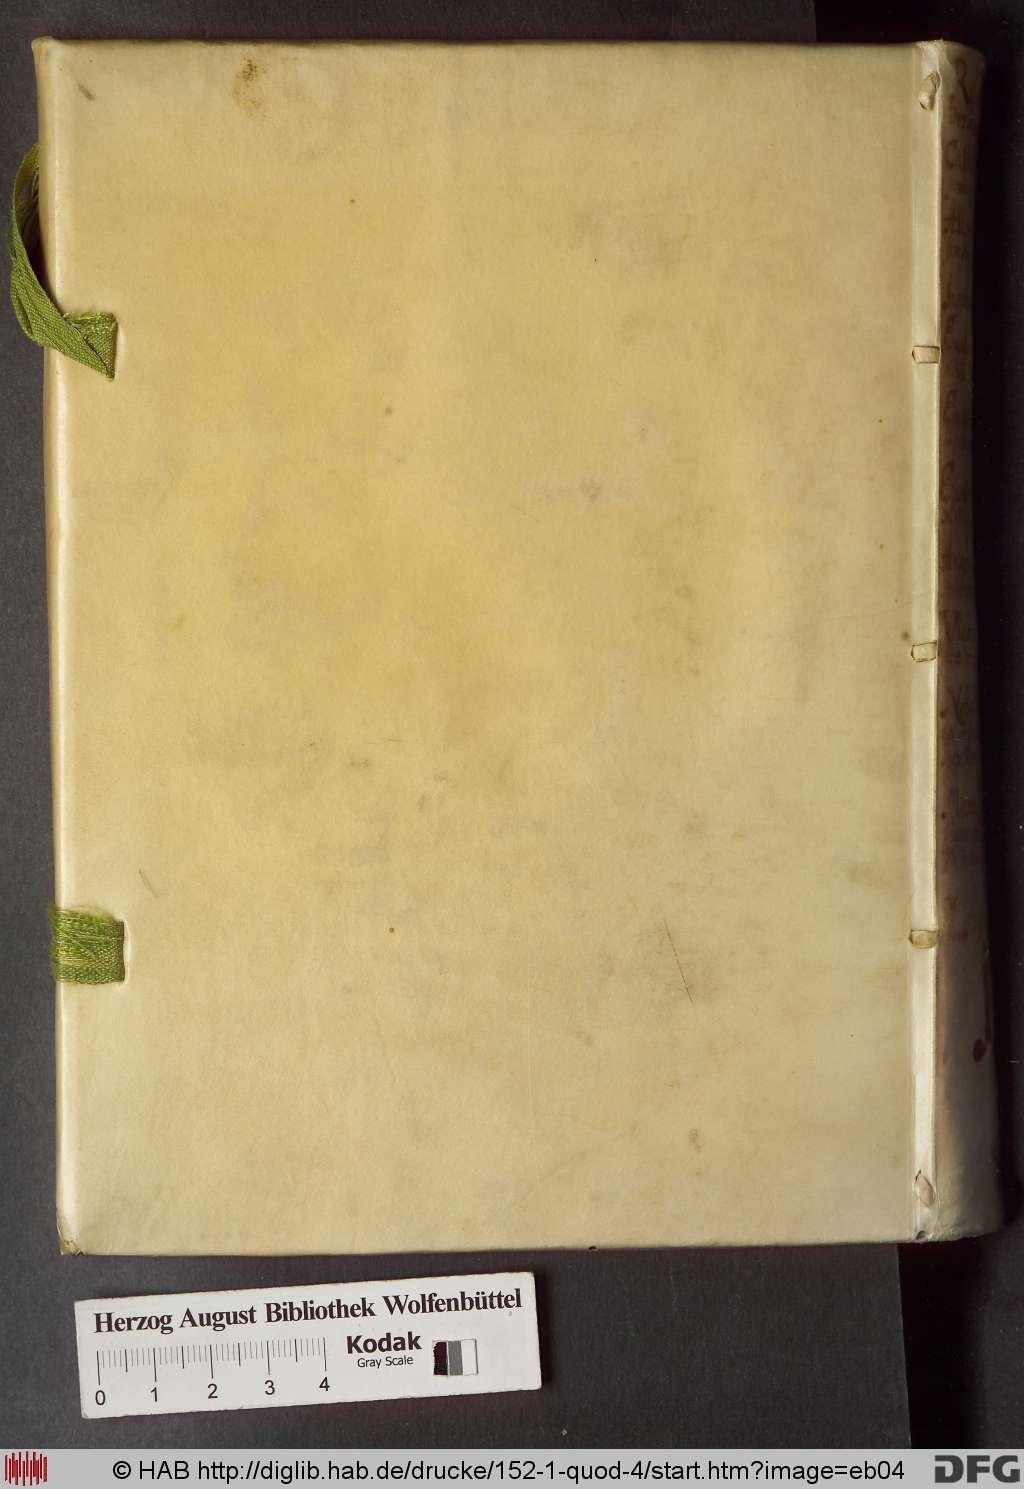 http://diglib.hab.de/drucke/152-1-quod-4/eb04.jpg